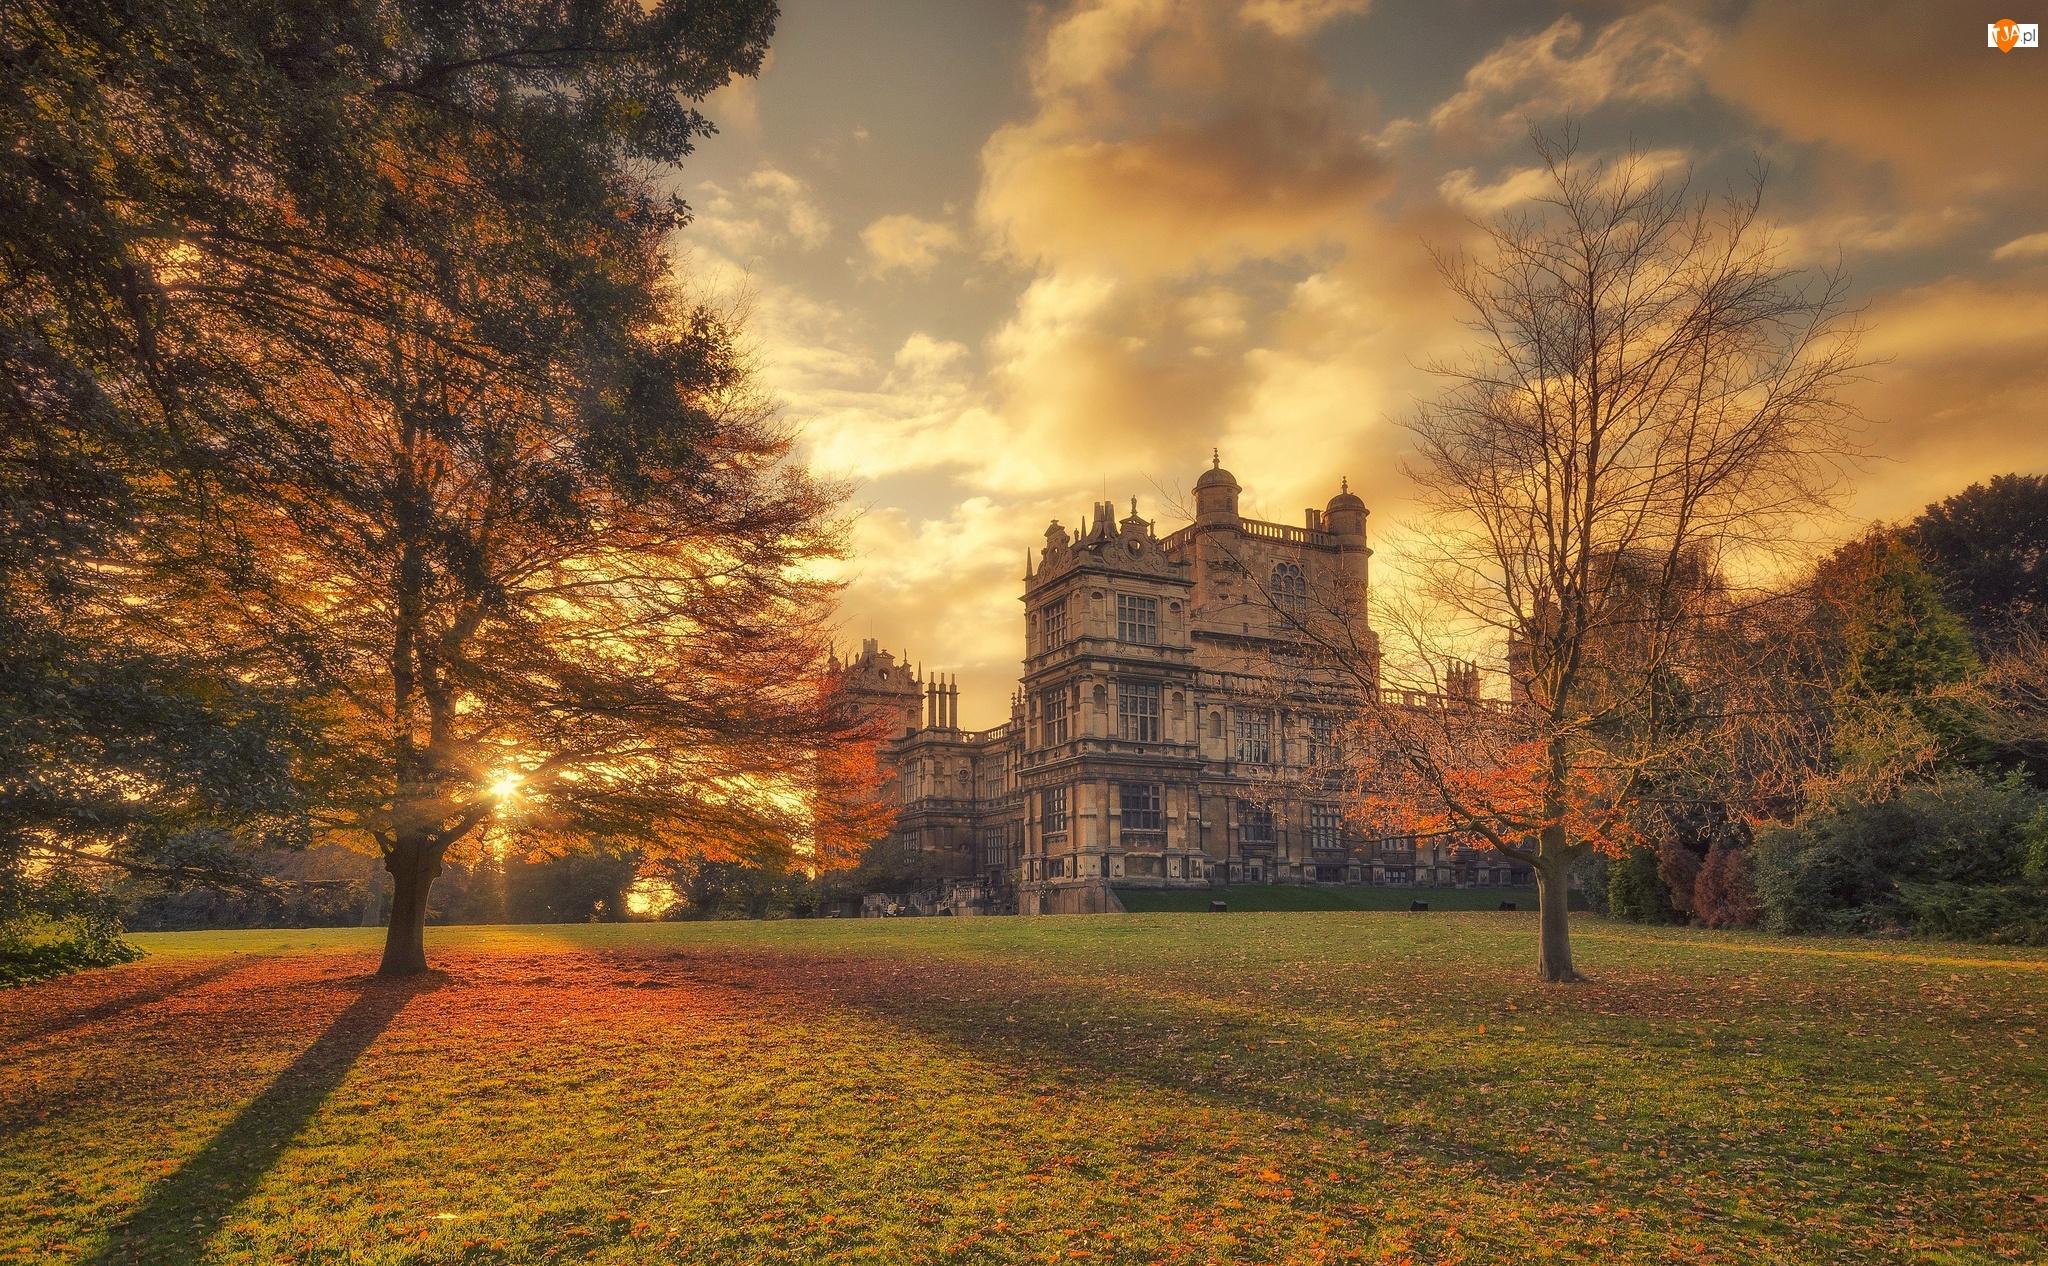 Nottingham Natural History Museum, Jesień, Nottingham, Park, Anglia, Drzewa, Muzeum Wollaton Hall, Chmury